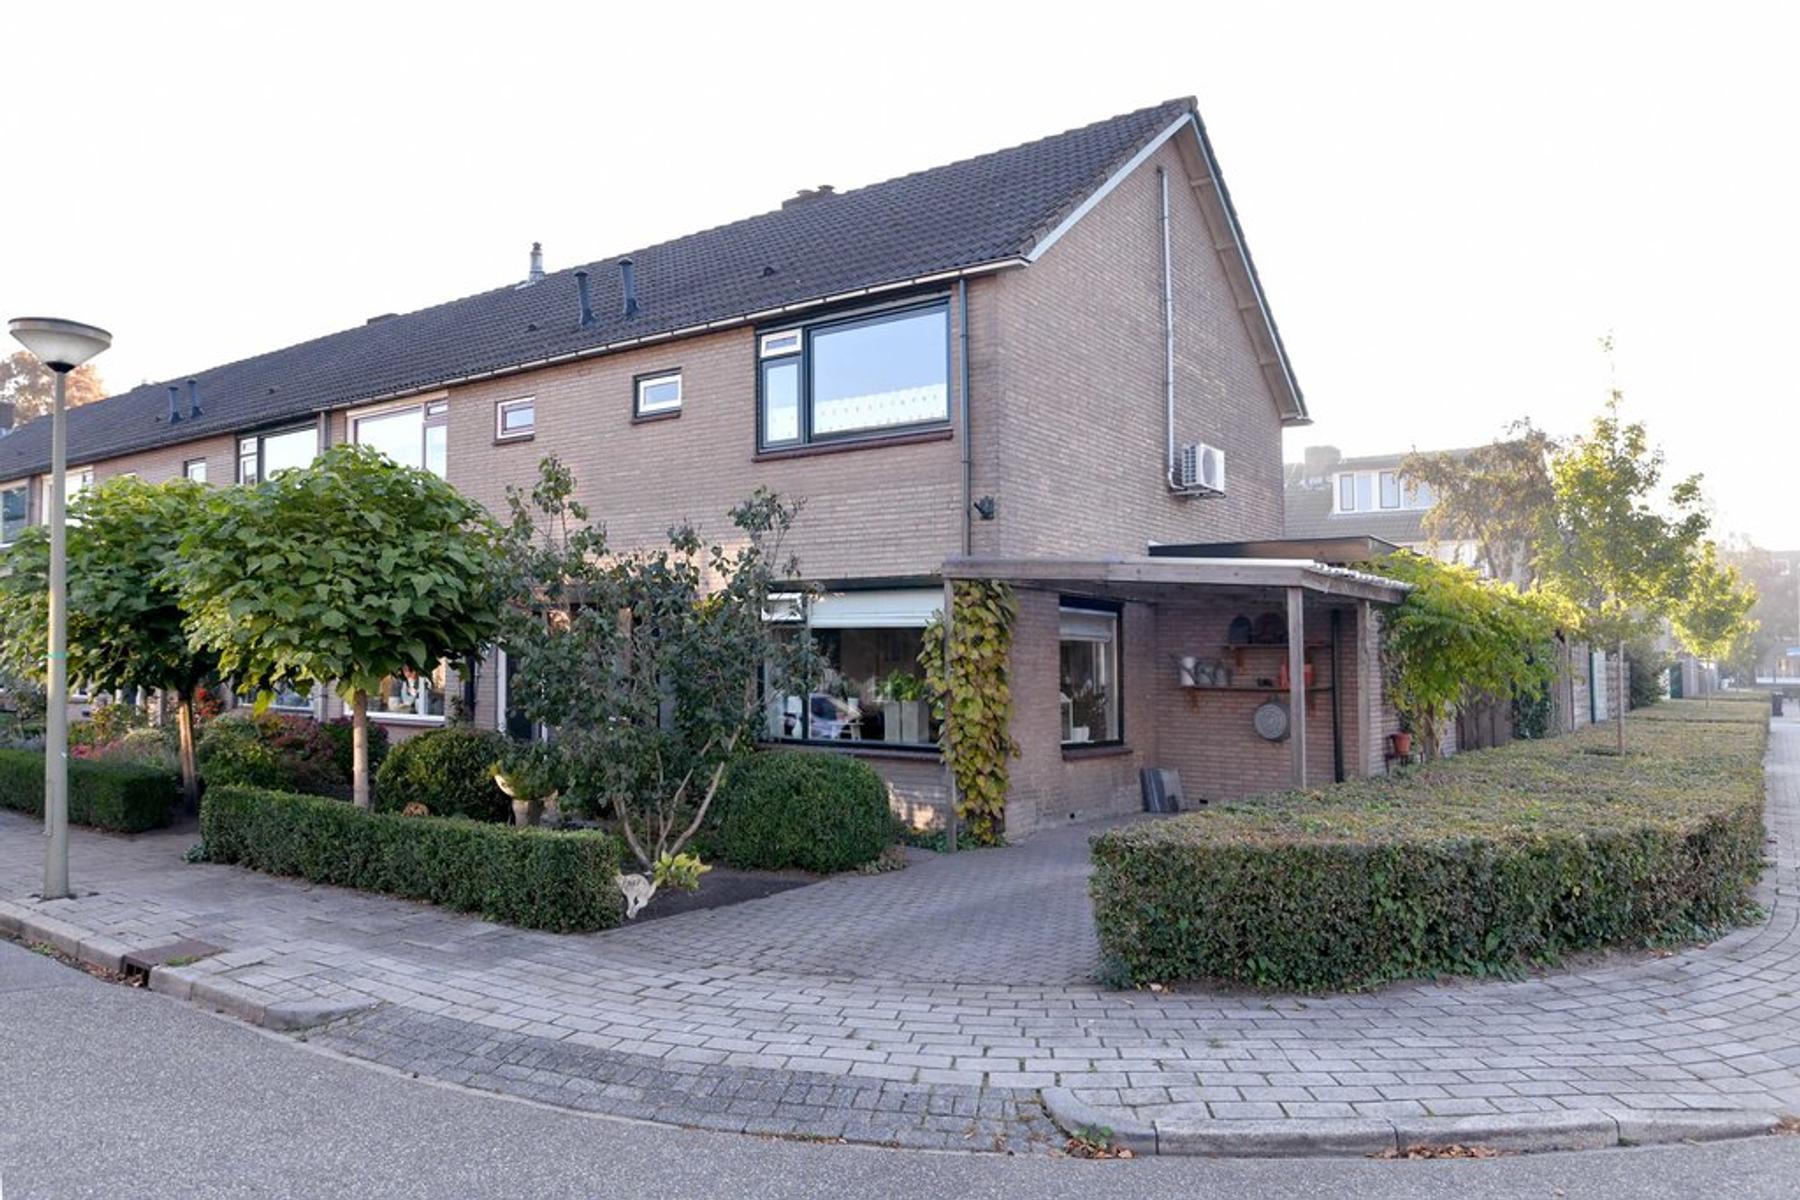 Offenbachstraat 32 in Eerbeek 6961 CB